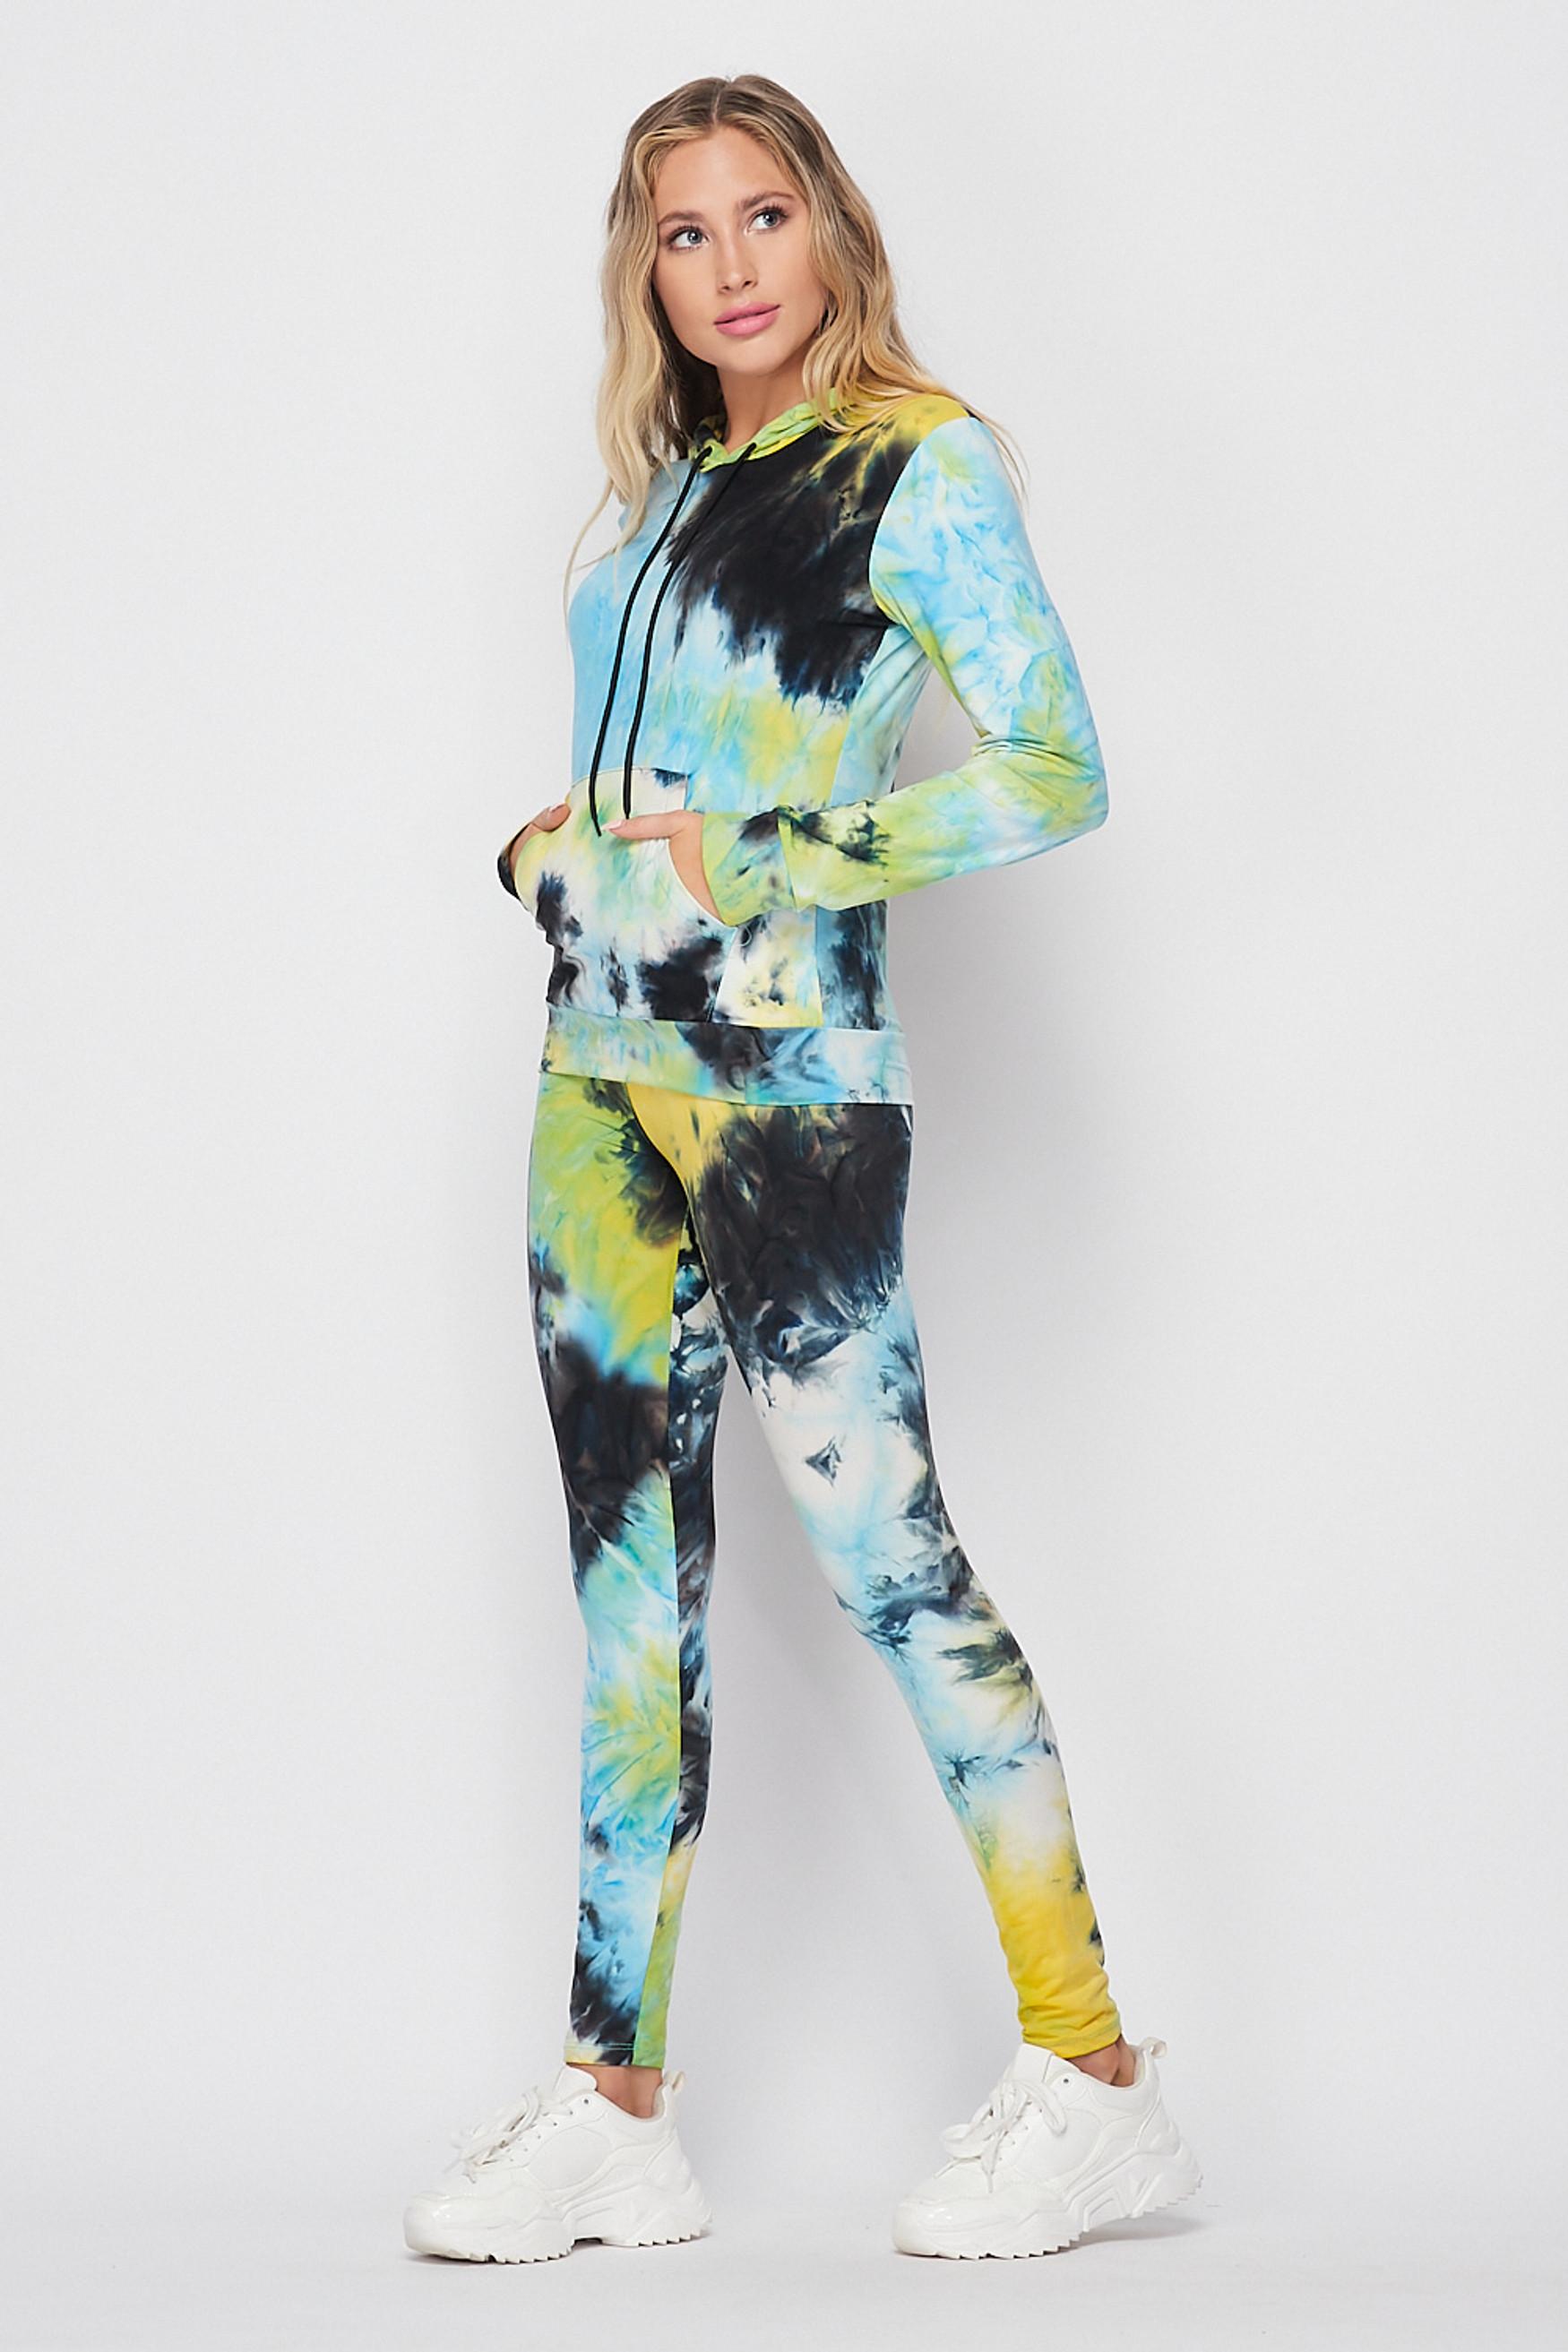 Blue Tie Dye 2 Piece Leggings and Hooded Jacket Set